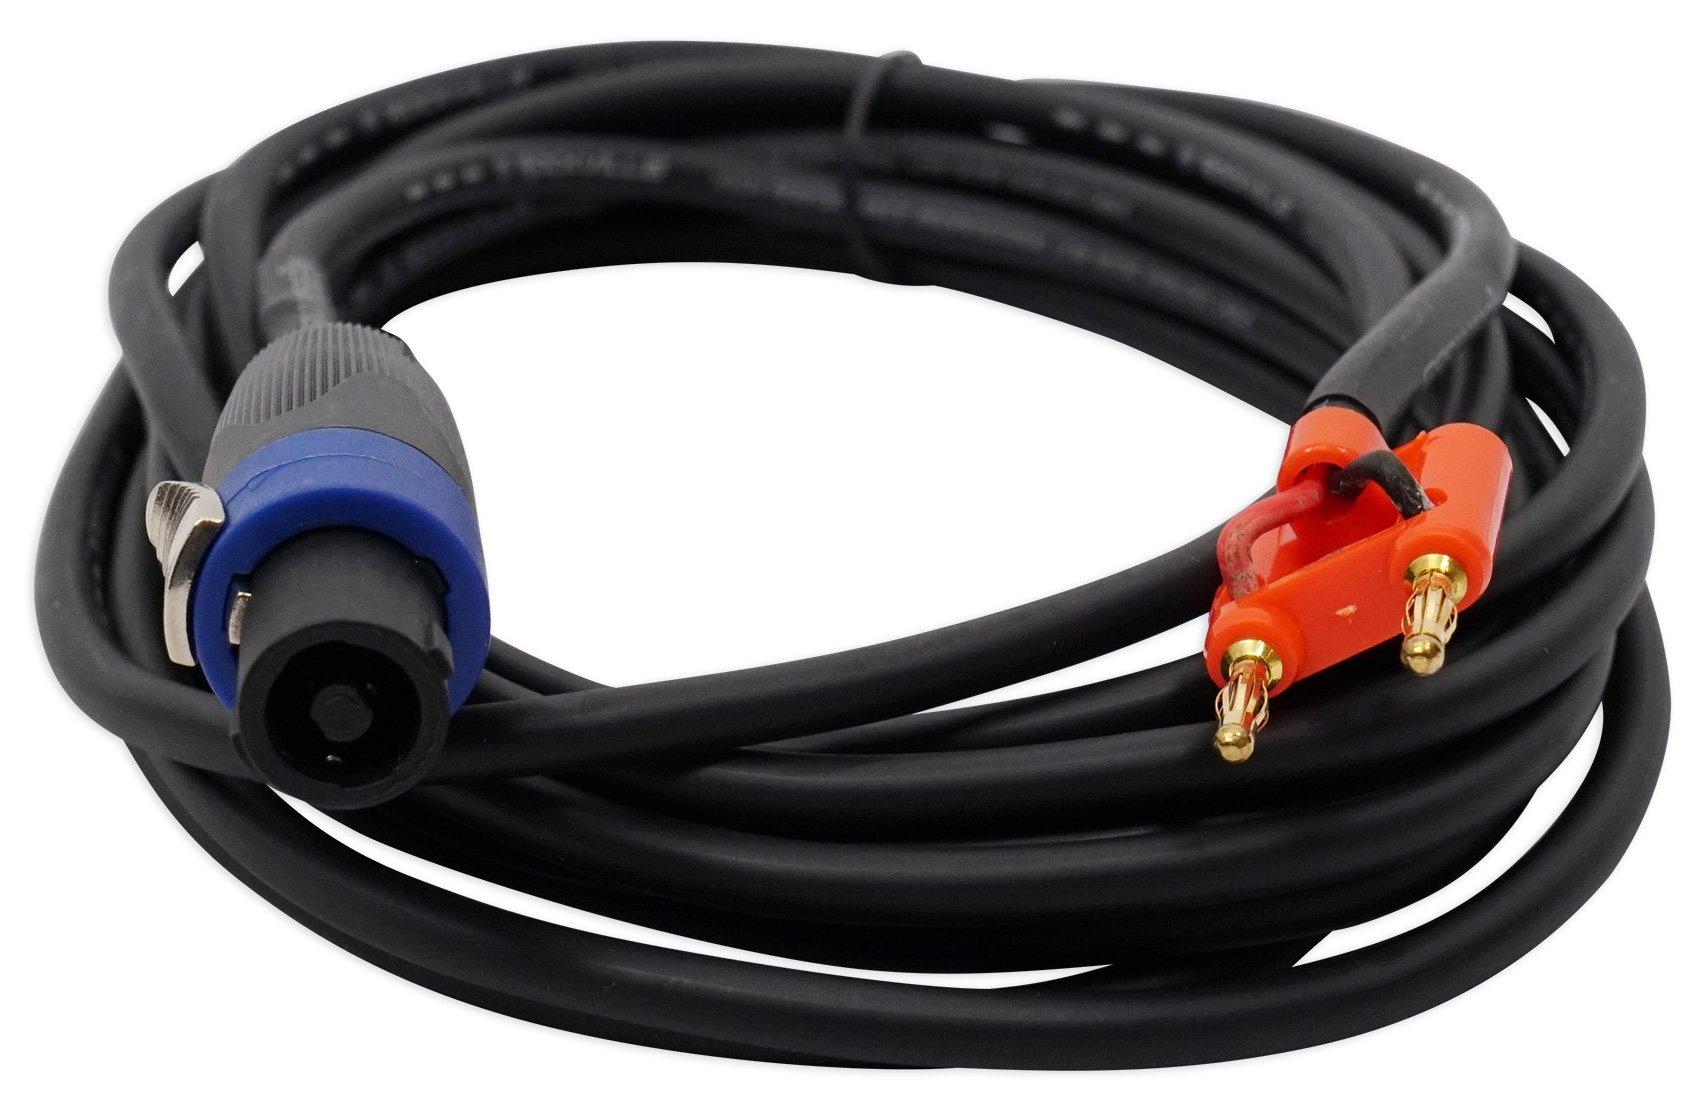 Rockville 20 Foot Speakon to Banana Speaker Cable, 16 Gauge, 100% Copper! (RSB16) by Rockville (Image #1)